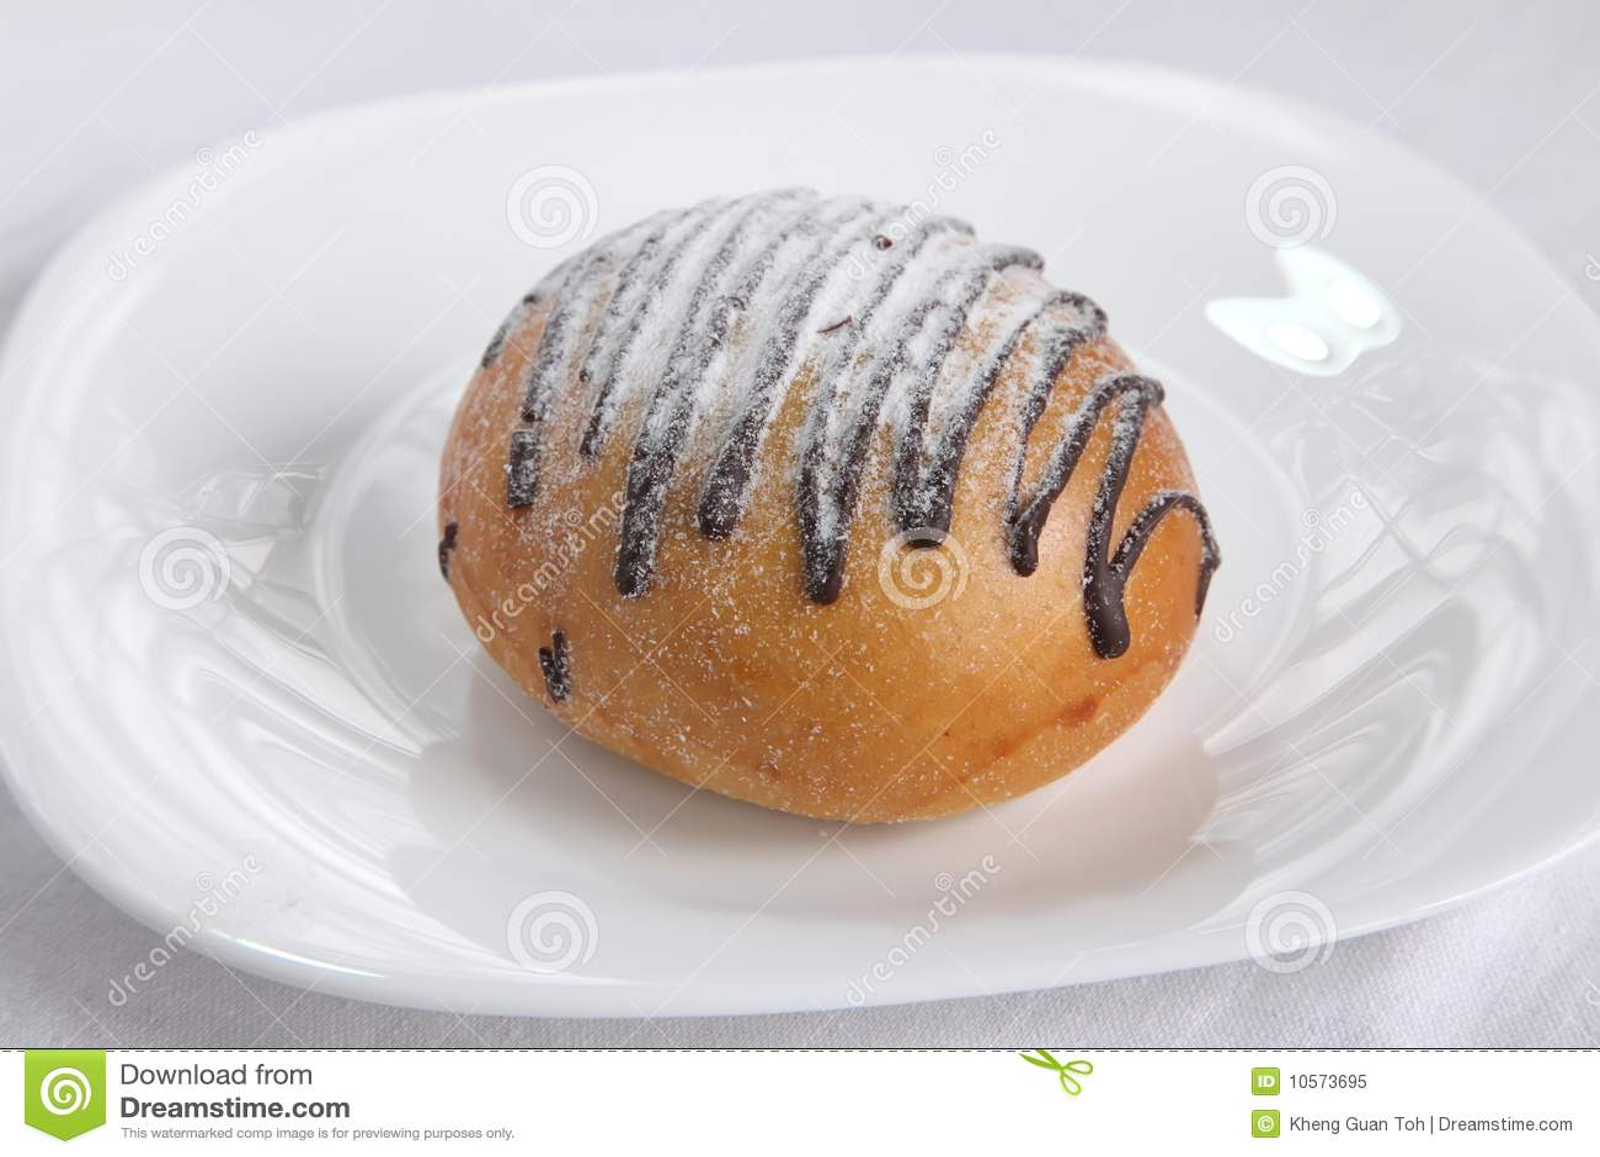 Chocolate Swirl Bun Royalty Free Stock Photo - Image: 10573695